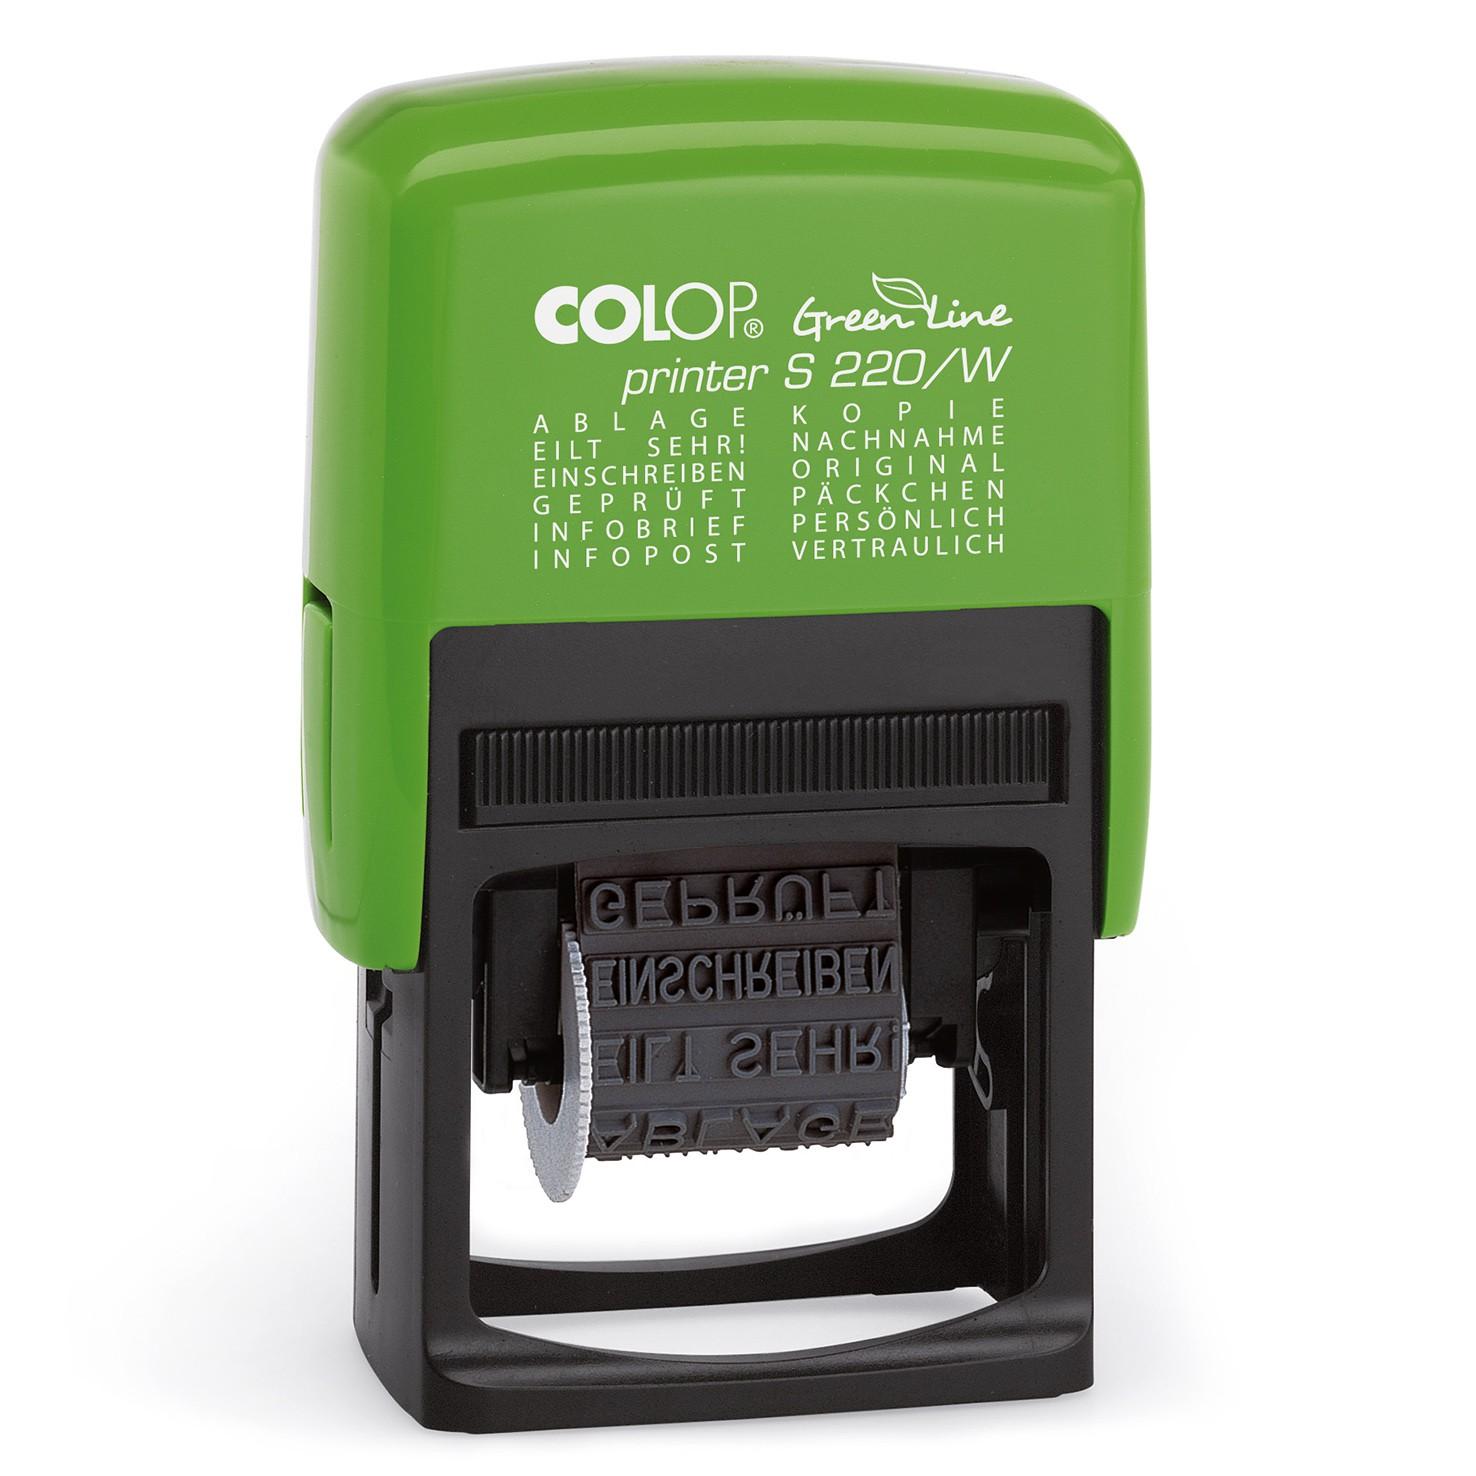 colop green line printer 12in1 stempel mit 12 fertigen stempeltexten s220 w wortbandstempel. Black Bedroom Furniture Sets. Home Design Ideas